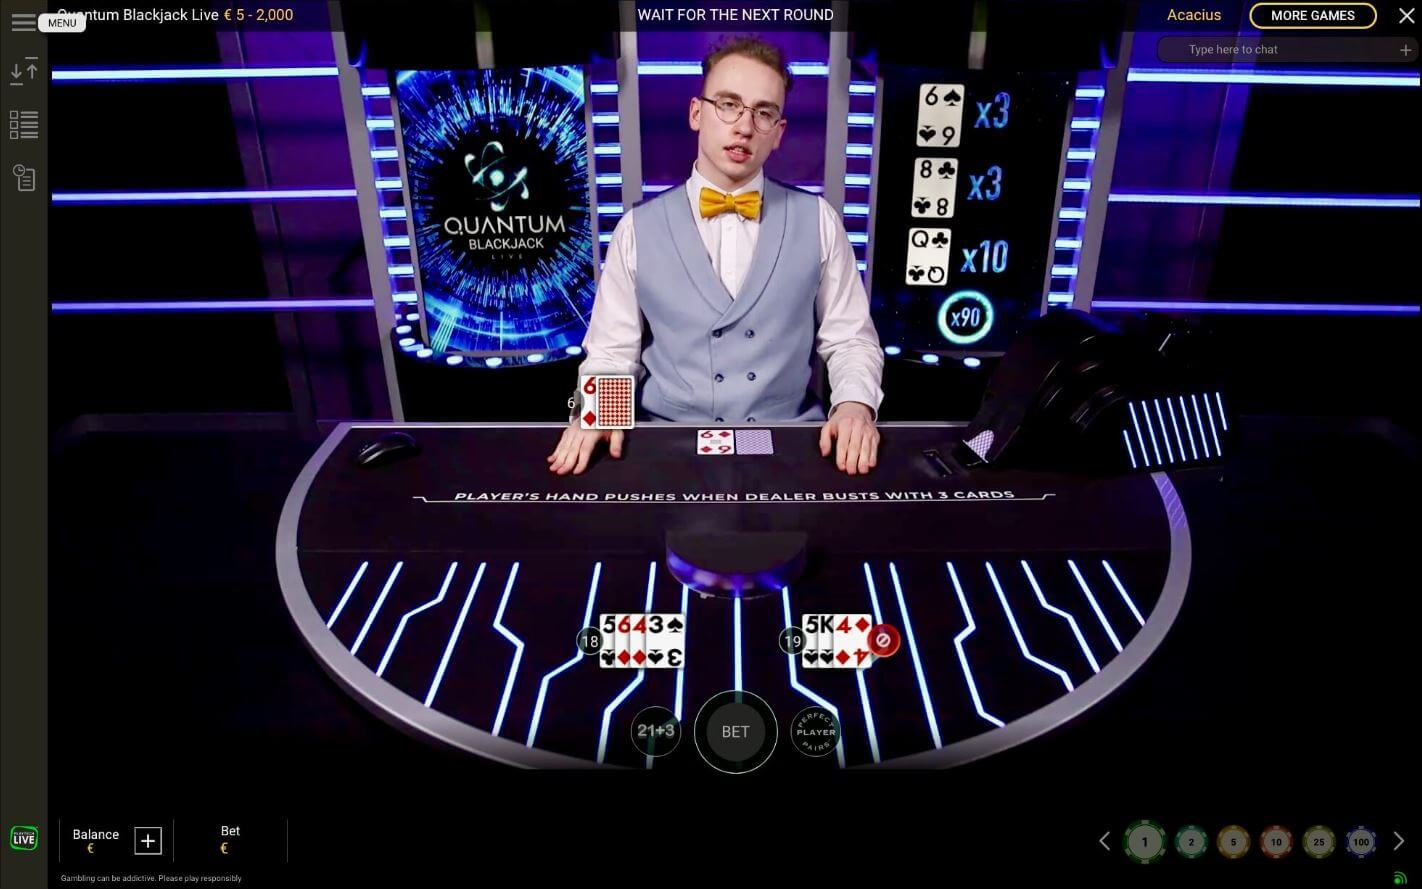 Live blackjack online - Quantom Blackjack 1422x890